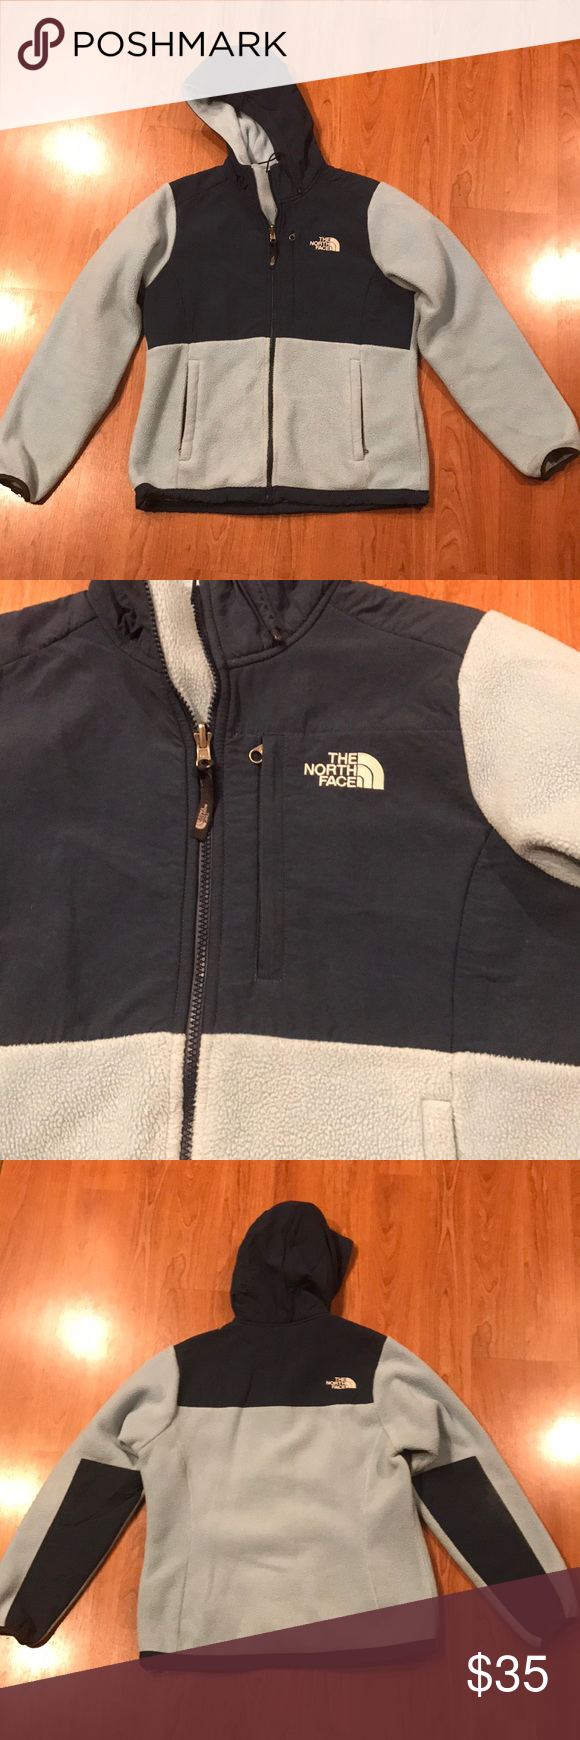 Hooded north face fleece jacket north face hooded zip up fleece